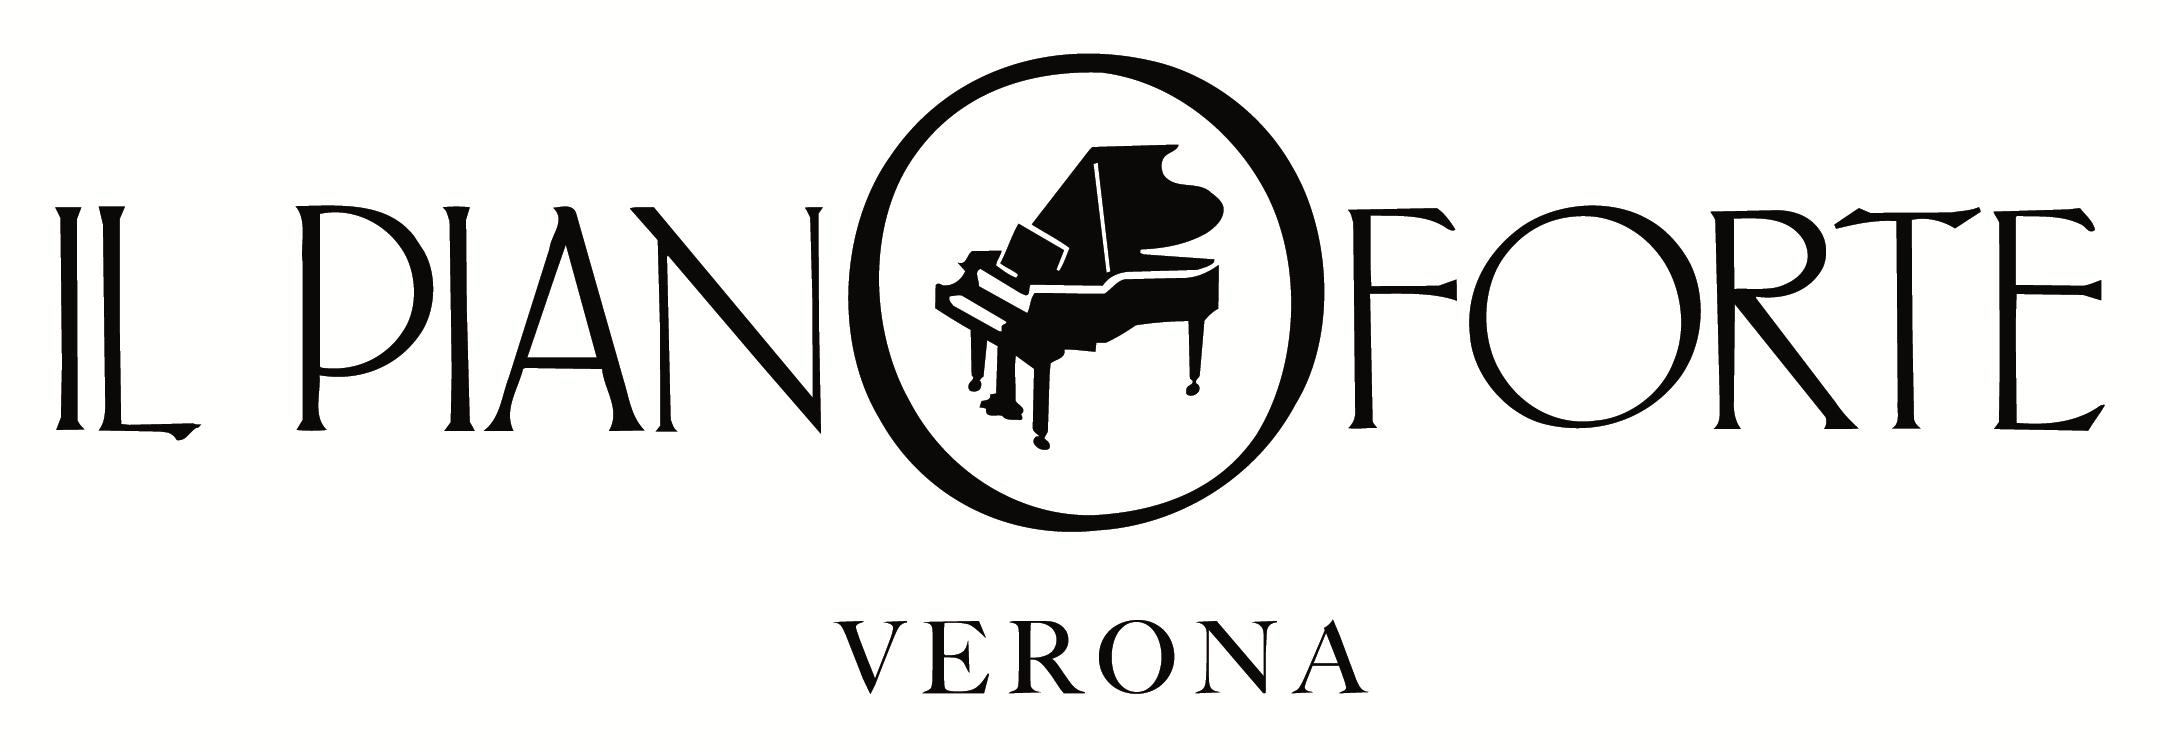 pianoforte png bianco